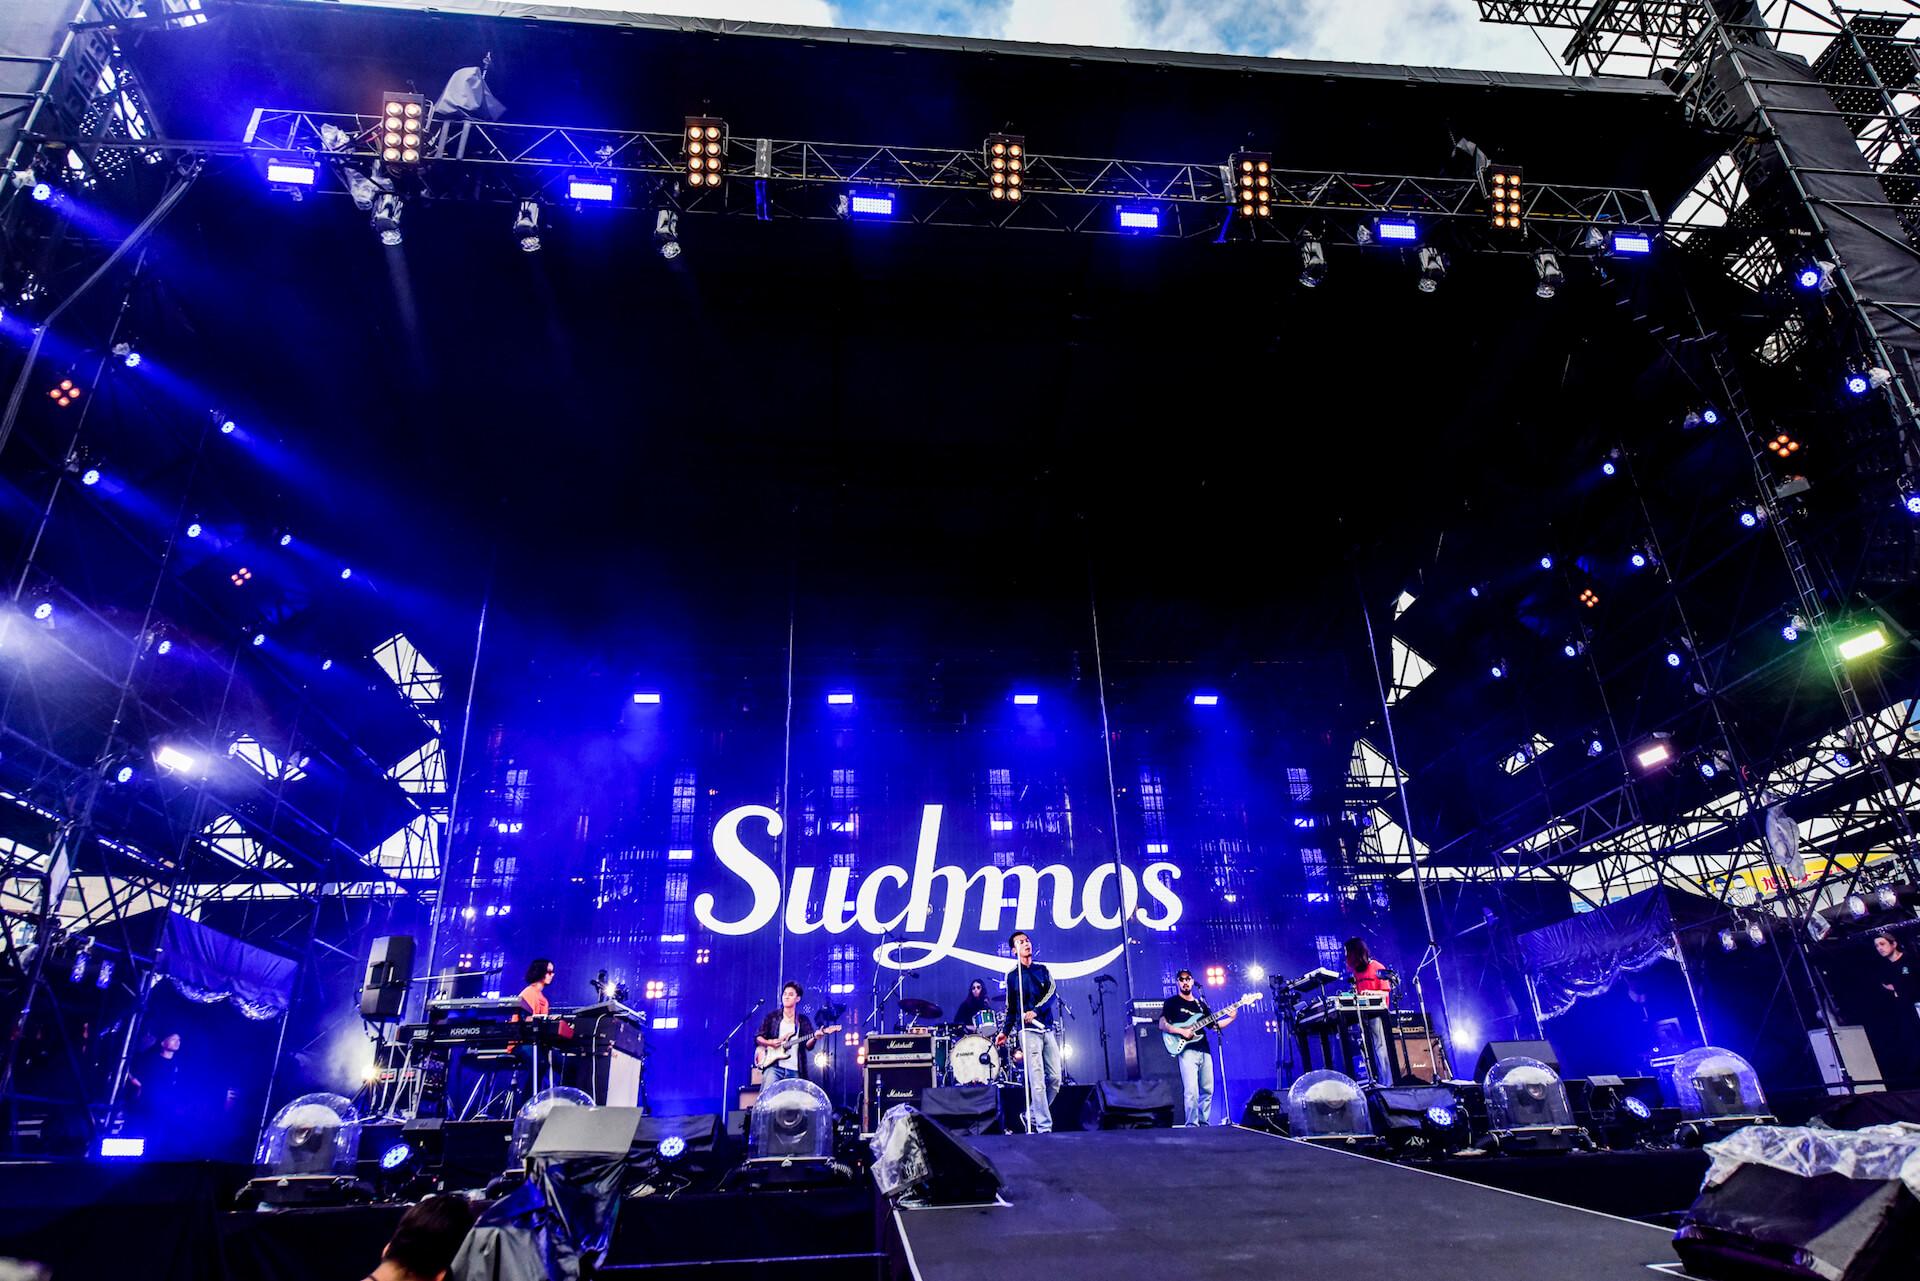 【Photo Documentary】Suchmos THE LIVE 横浜スタジアム 65b88401cb38d8471d7ecb4b8507f9e3